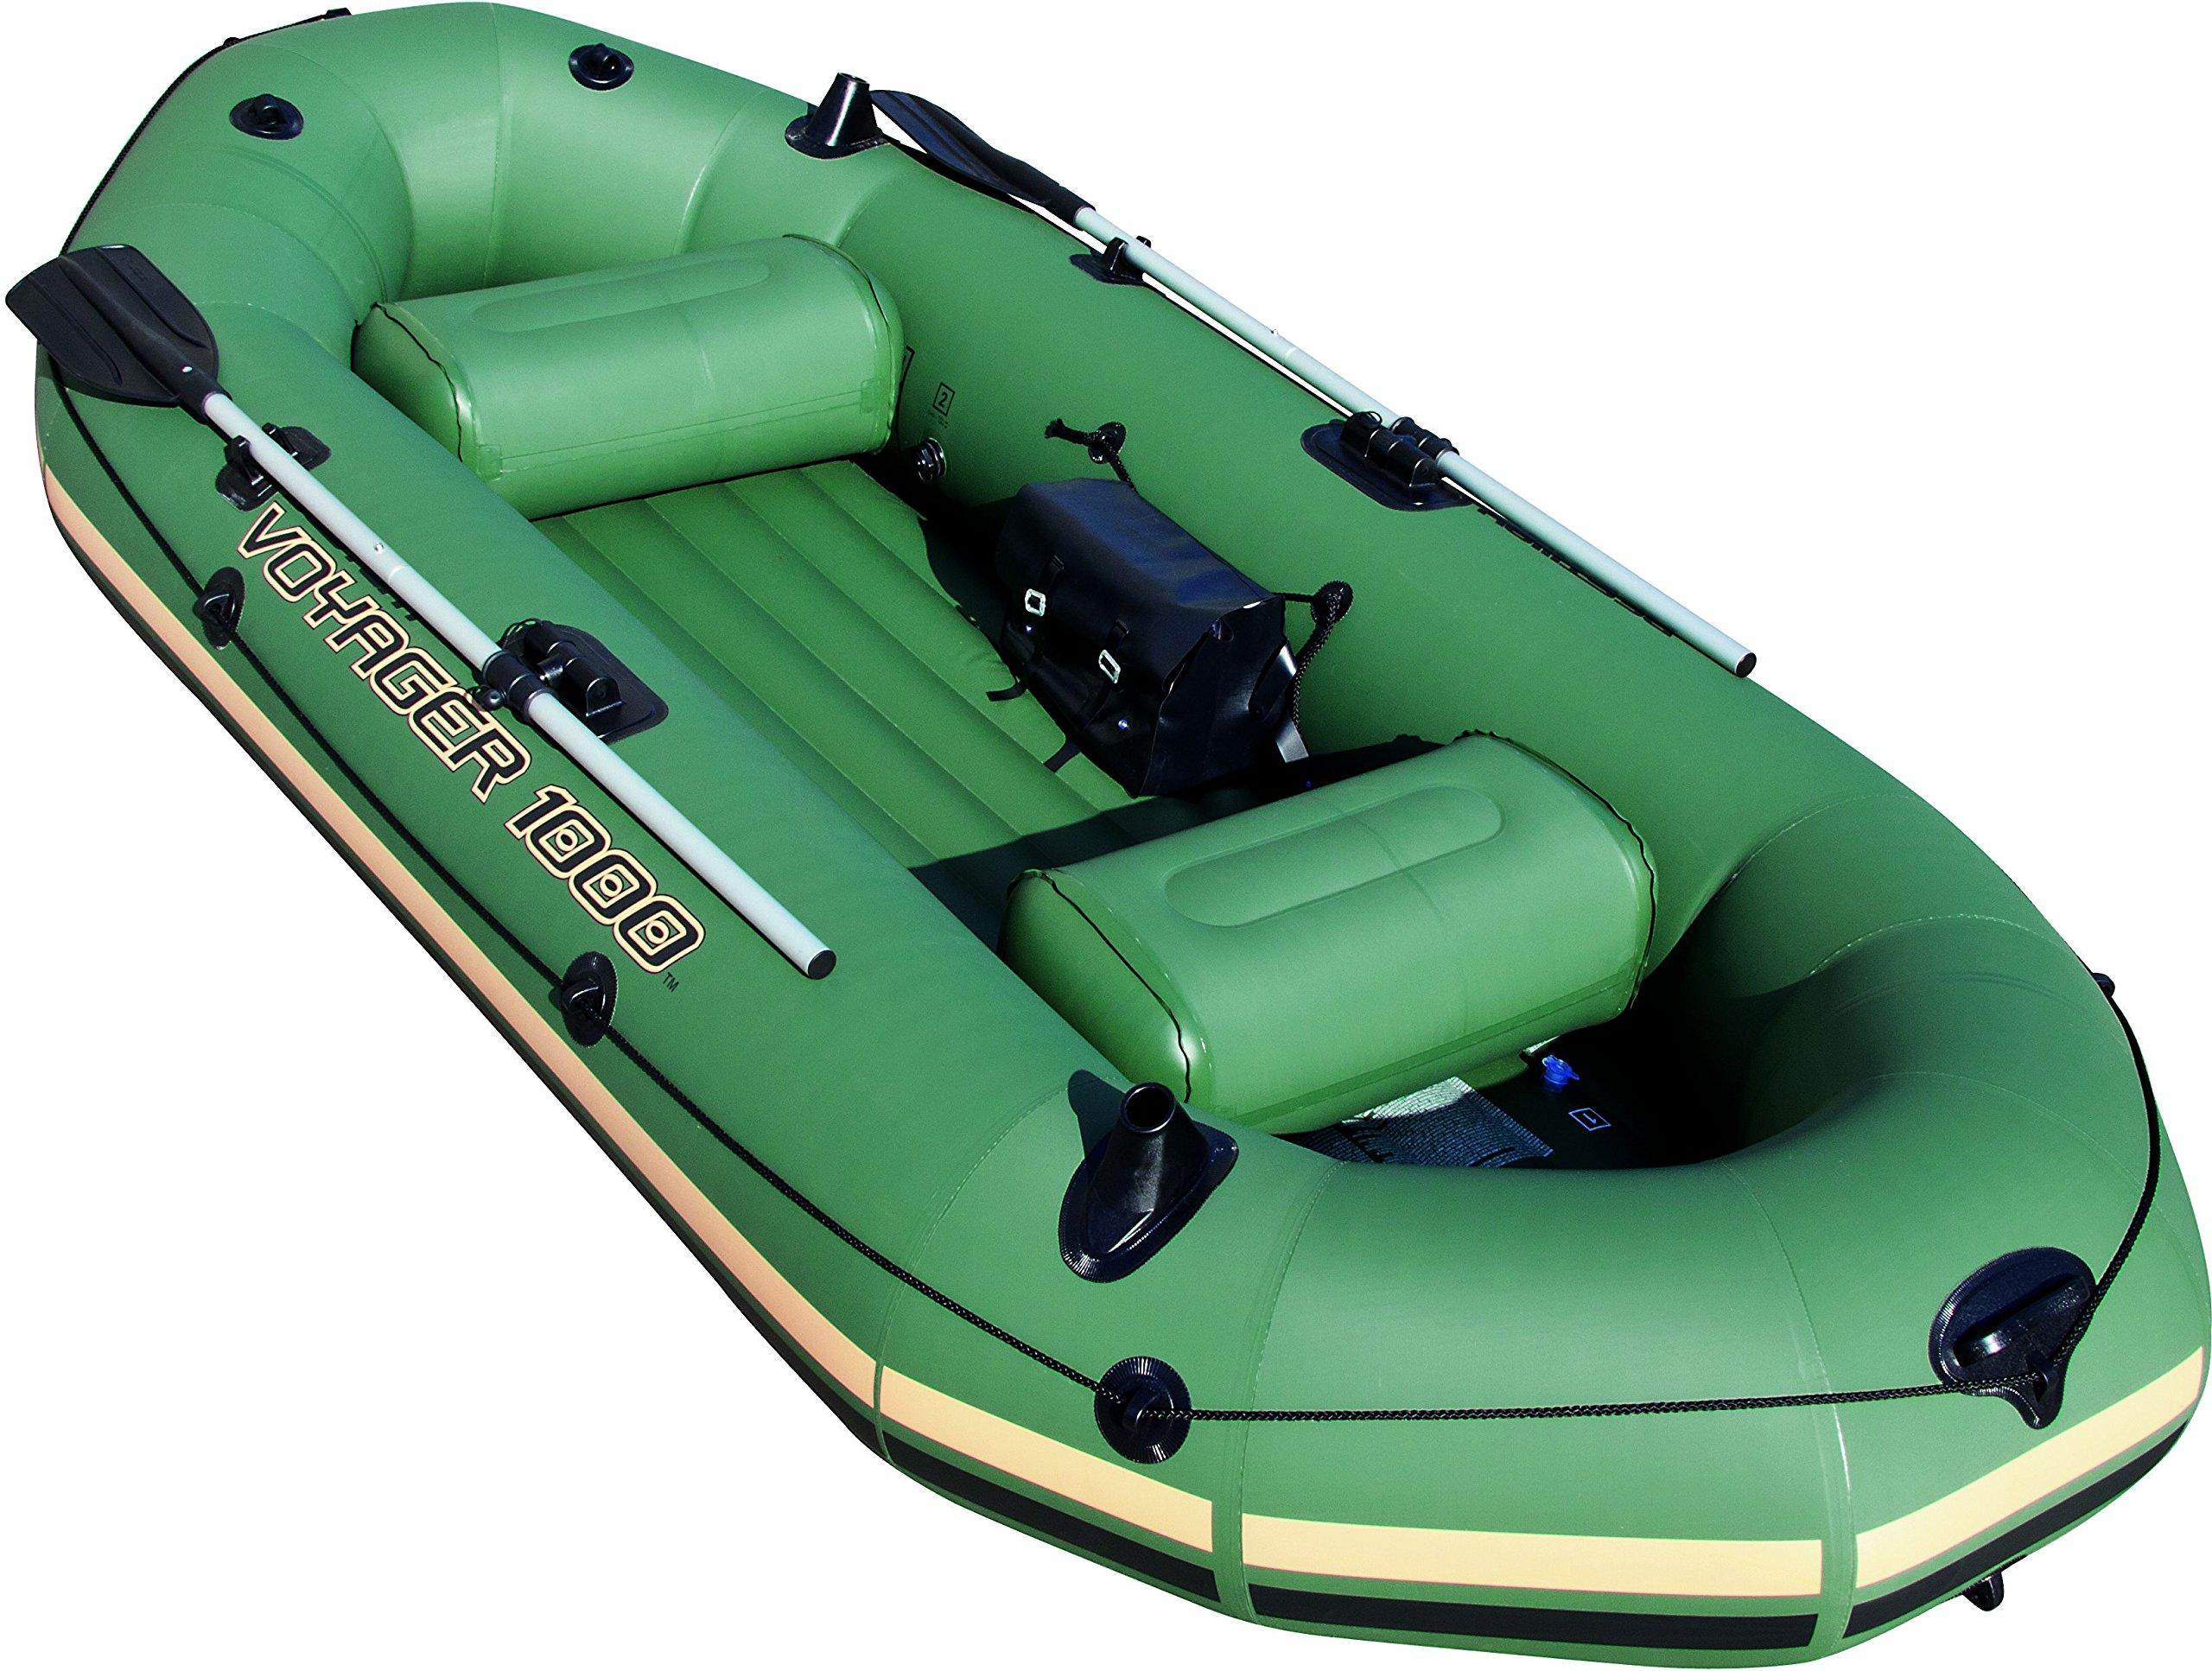 HydroForce Voyager 1000 Inflatable Raft by Bestway